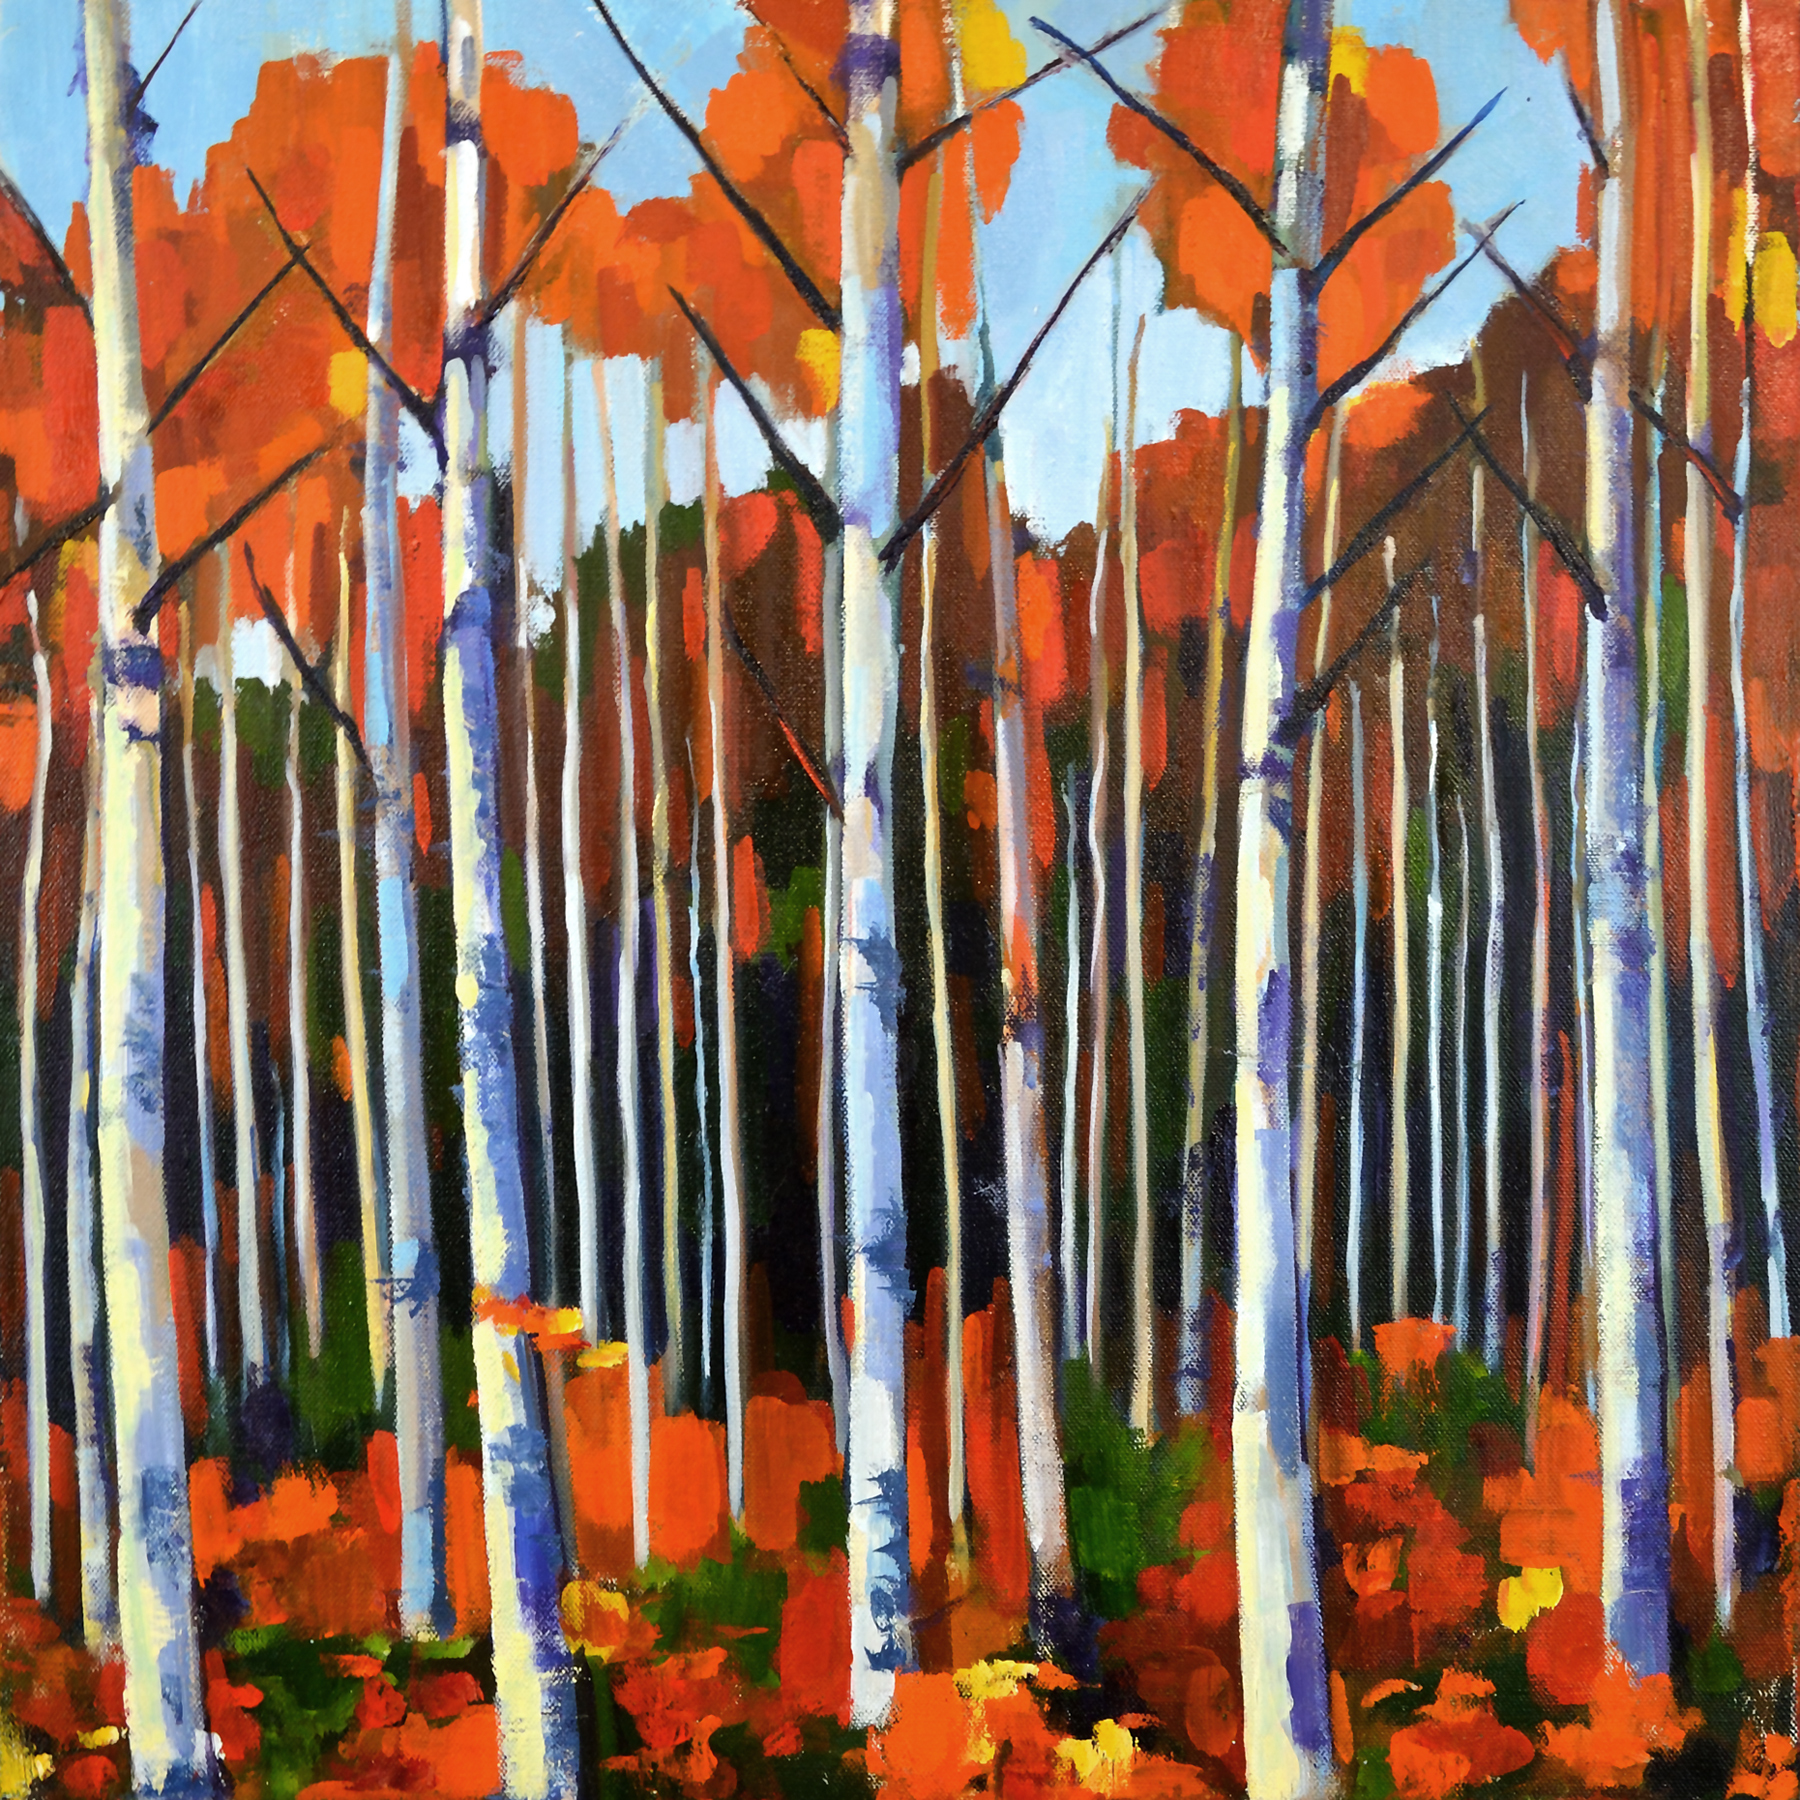 Small birch forest 20x20 200dpi.2 i1lt9g